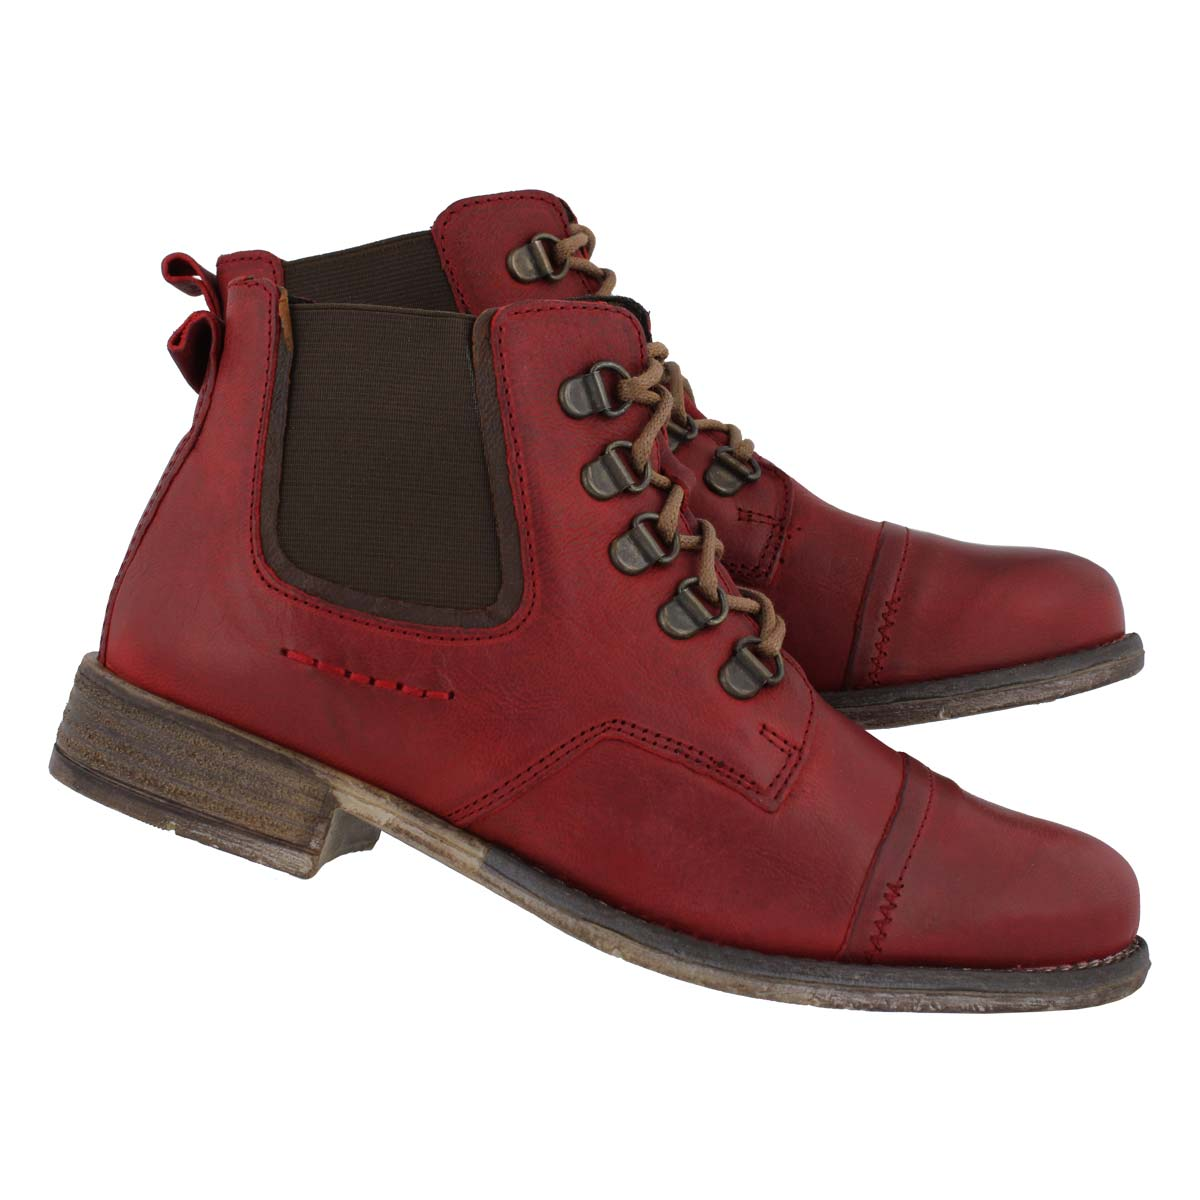 Lds Sienna 09 red/combi slip on bootie